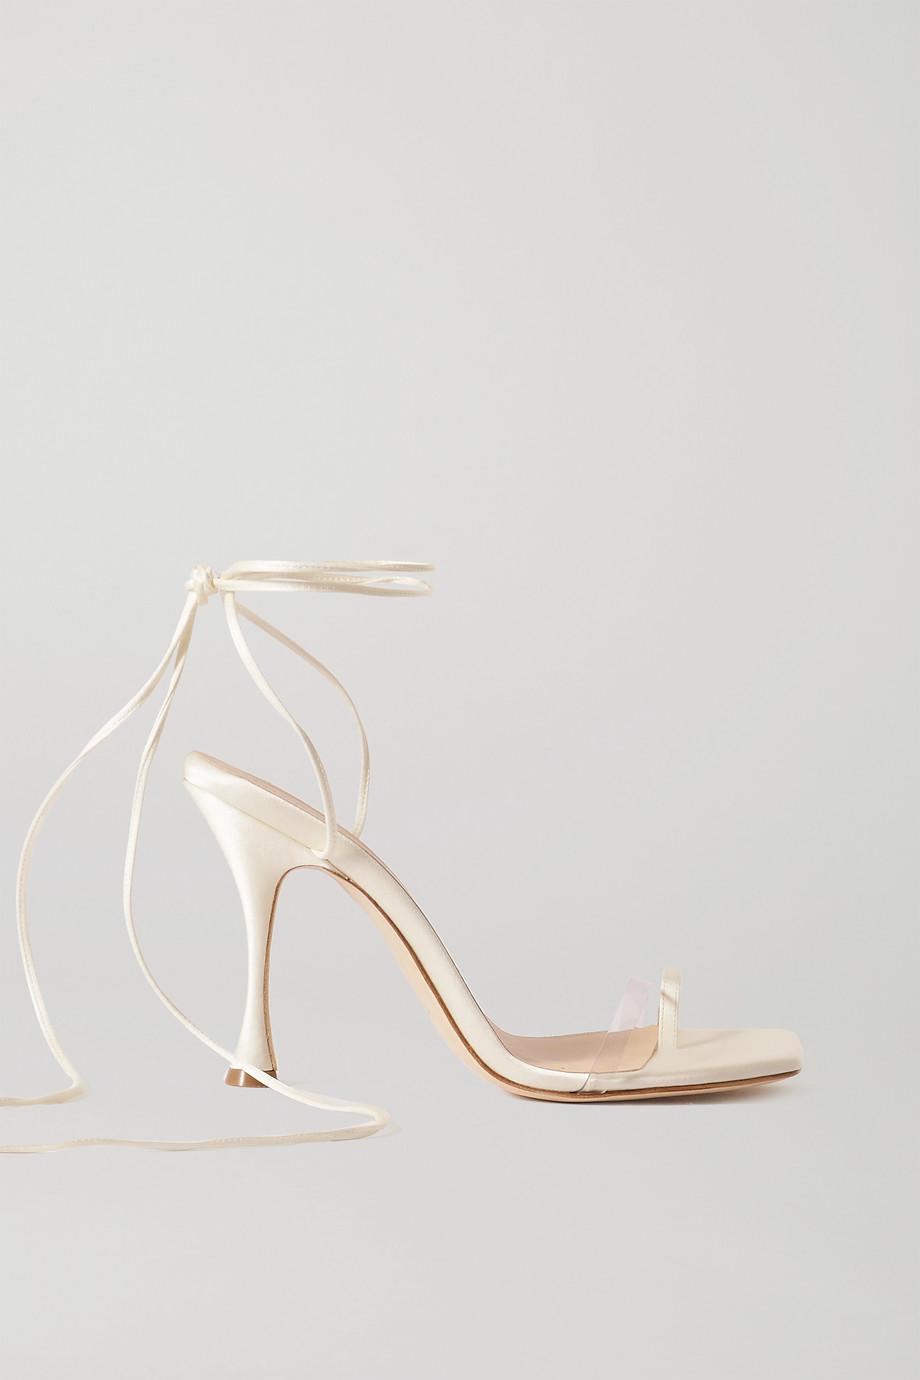 Magda Butrym Satin and PVC sandals